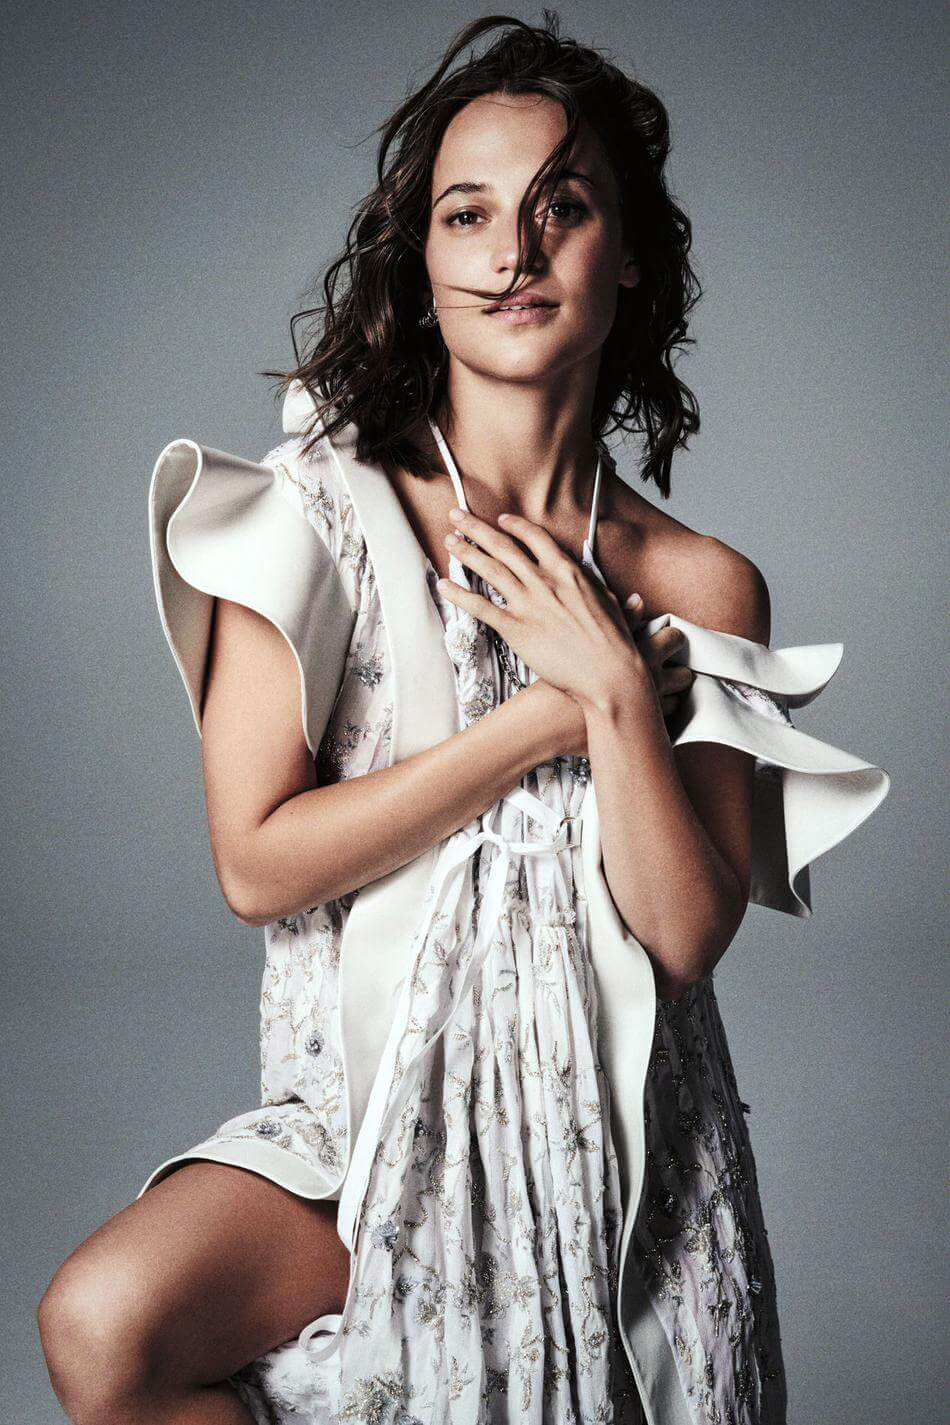 Alicia Vikander hot pictures